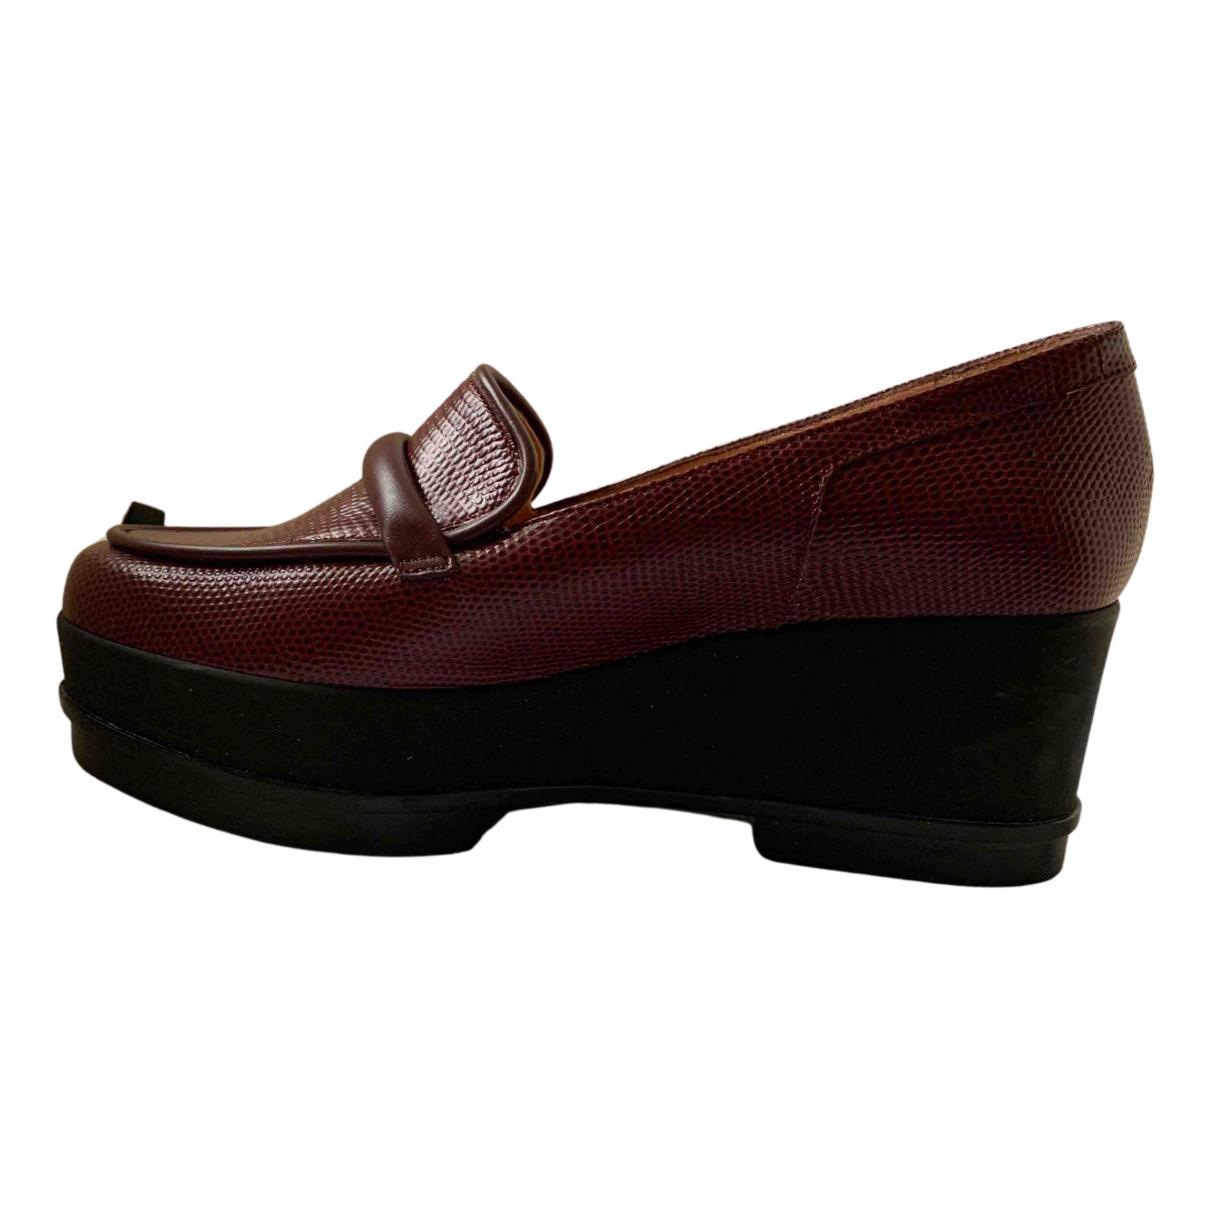 Robert Clergerie N Burgundy Leather Flats for Women 38.5 EU